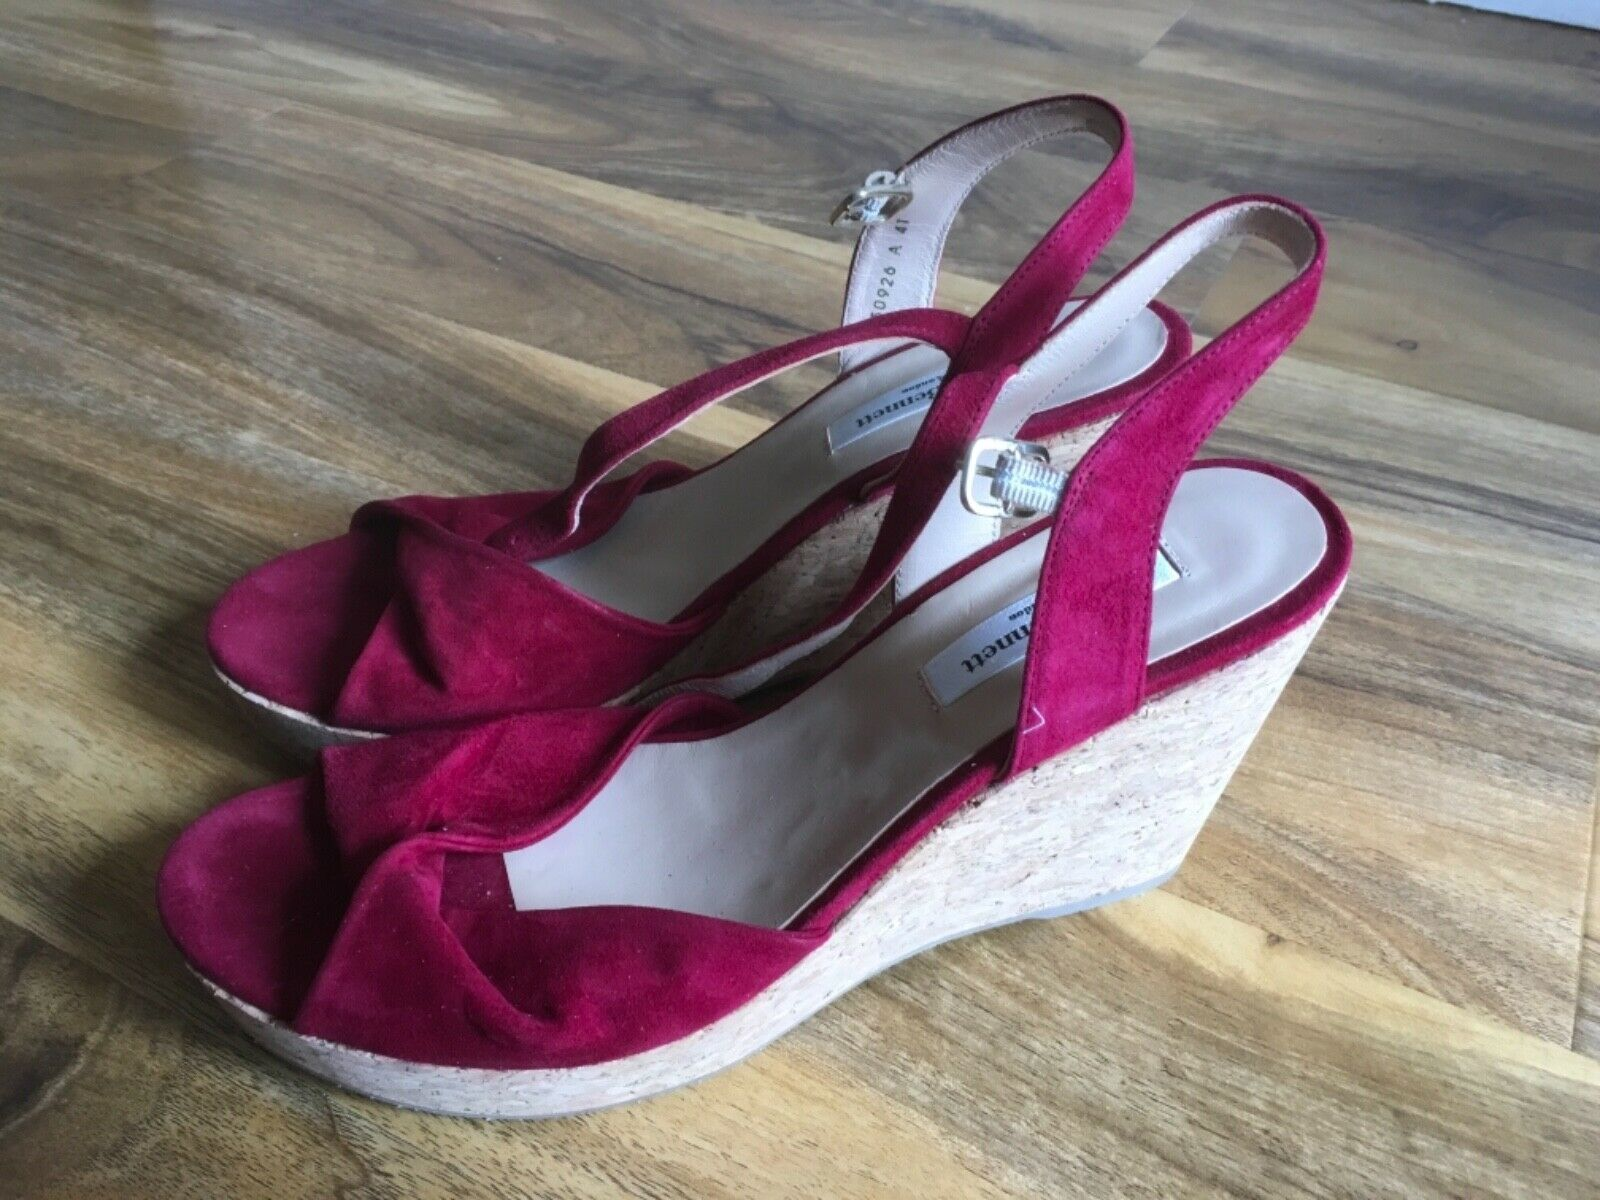 L.K. Bennett Adeline  Suede Wedge Sandals, rosso, Dimensione 41  vendite online